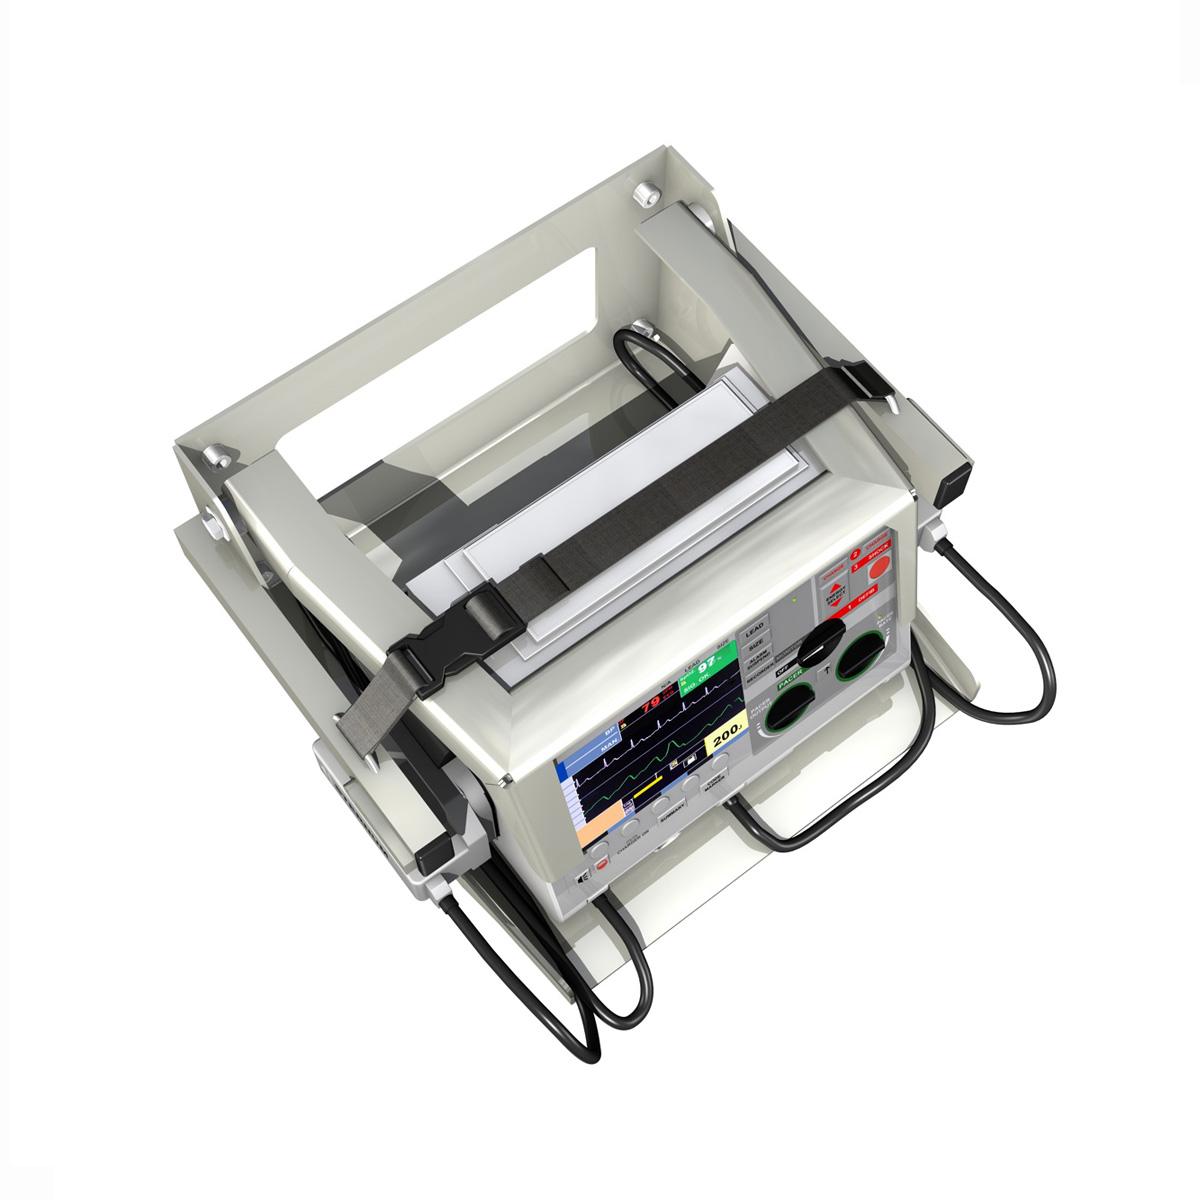 defibrillator 3d model 3ds c4d lwo obj 264212